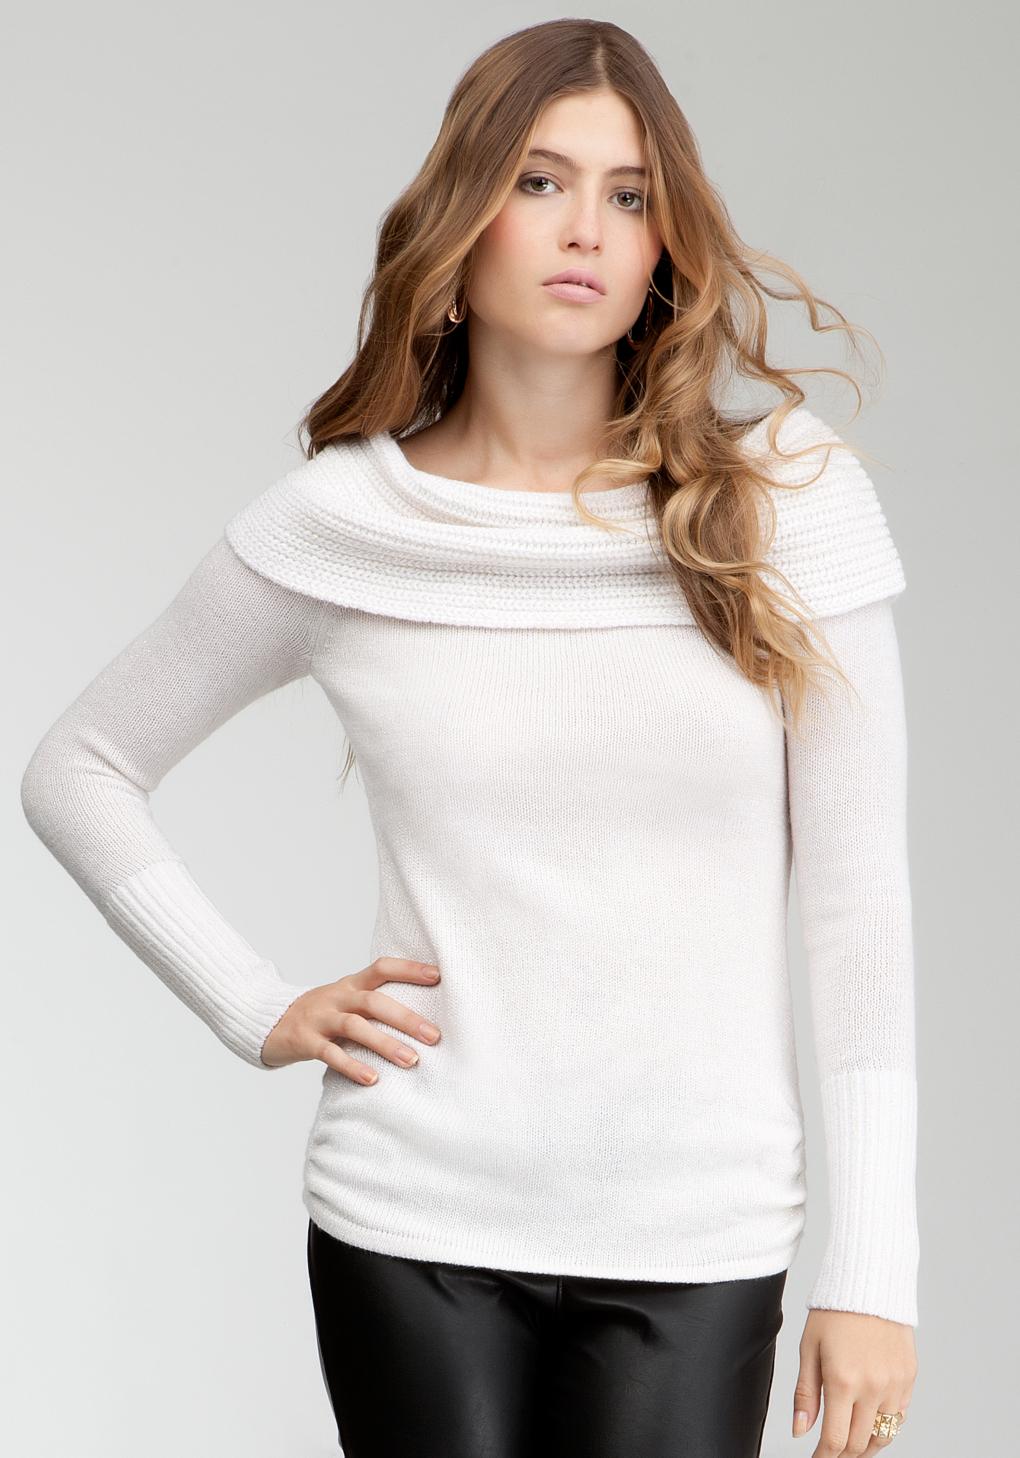 Bebe Off-Shoulder Metallic Sweater in White | Lyst